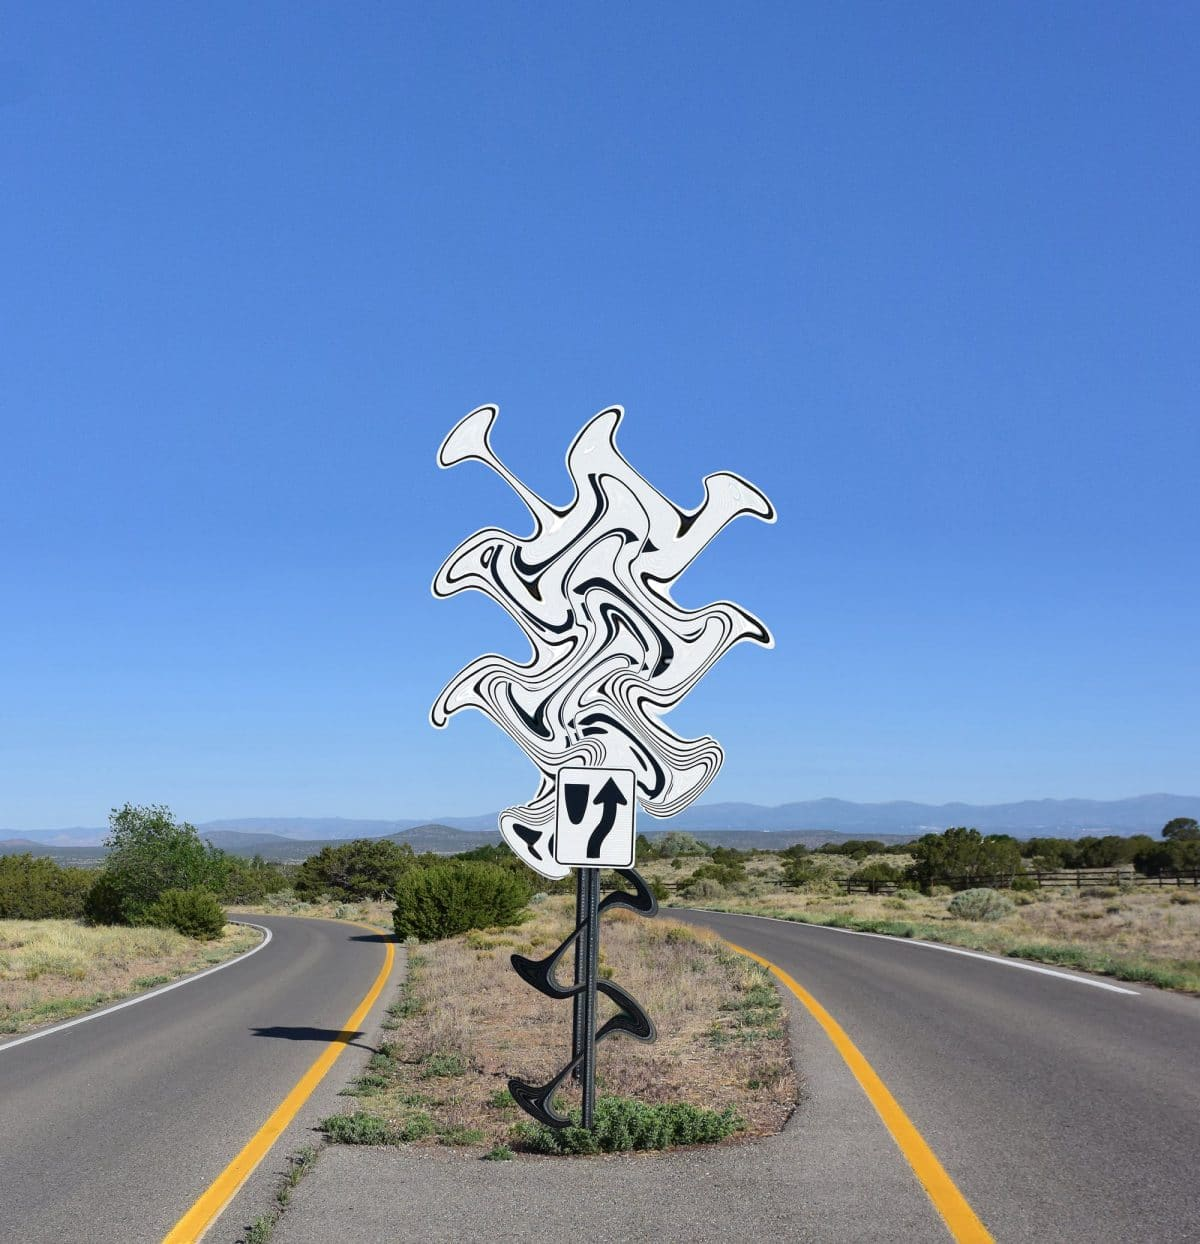 Intersection, Michael Jantzen, Road closed, art, culture